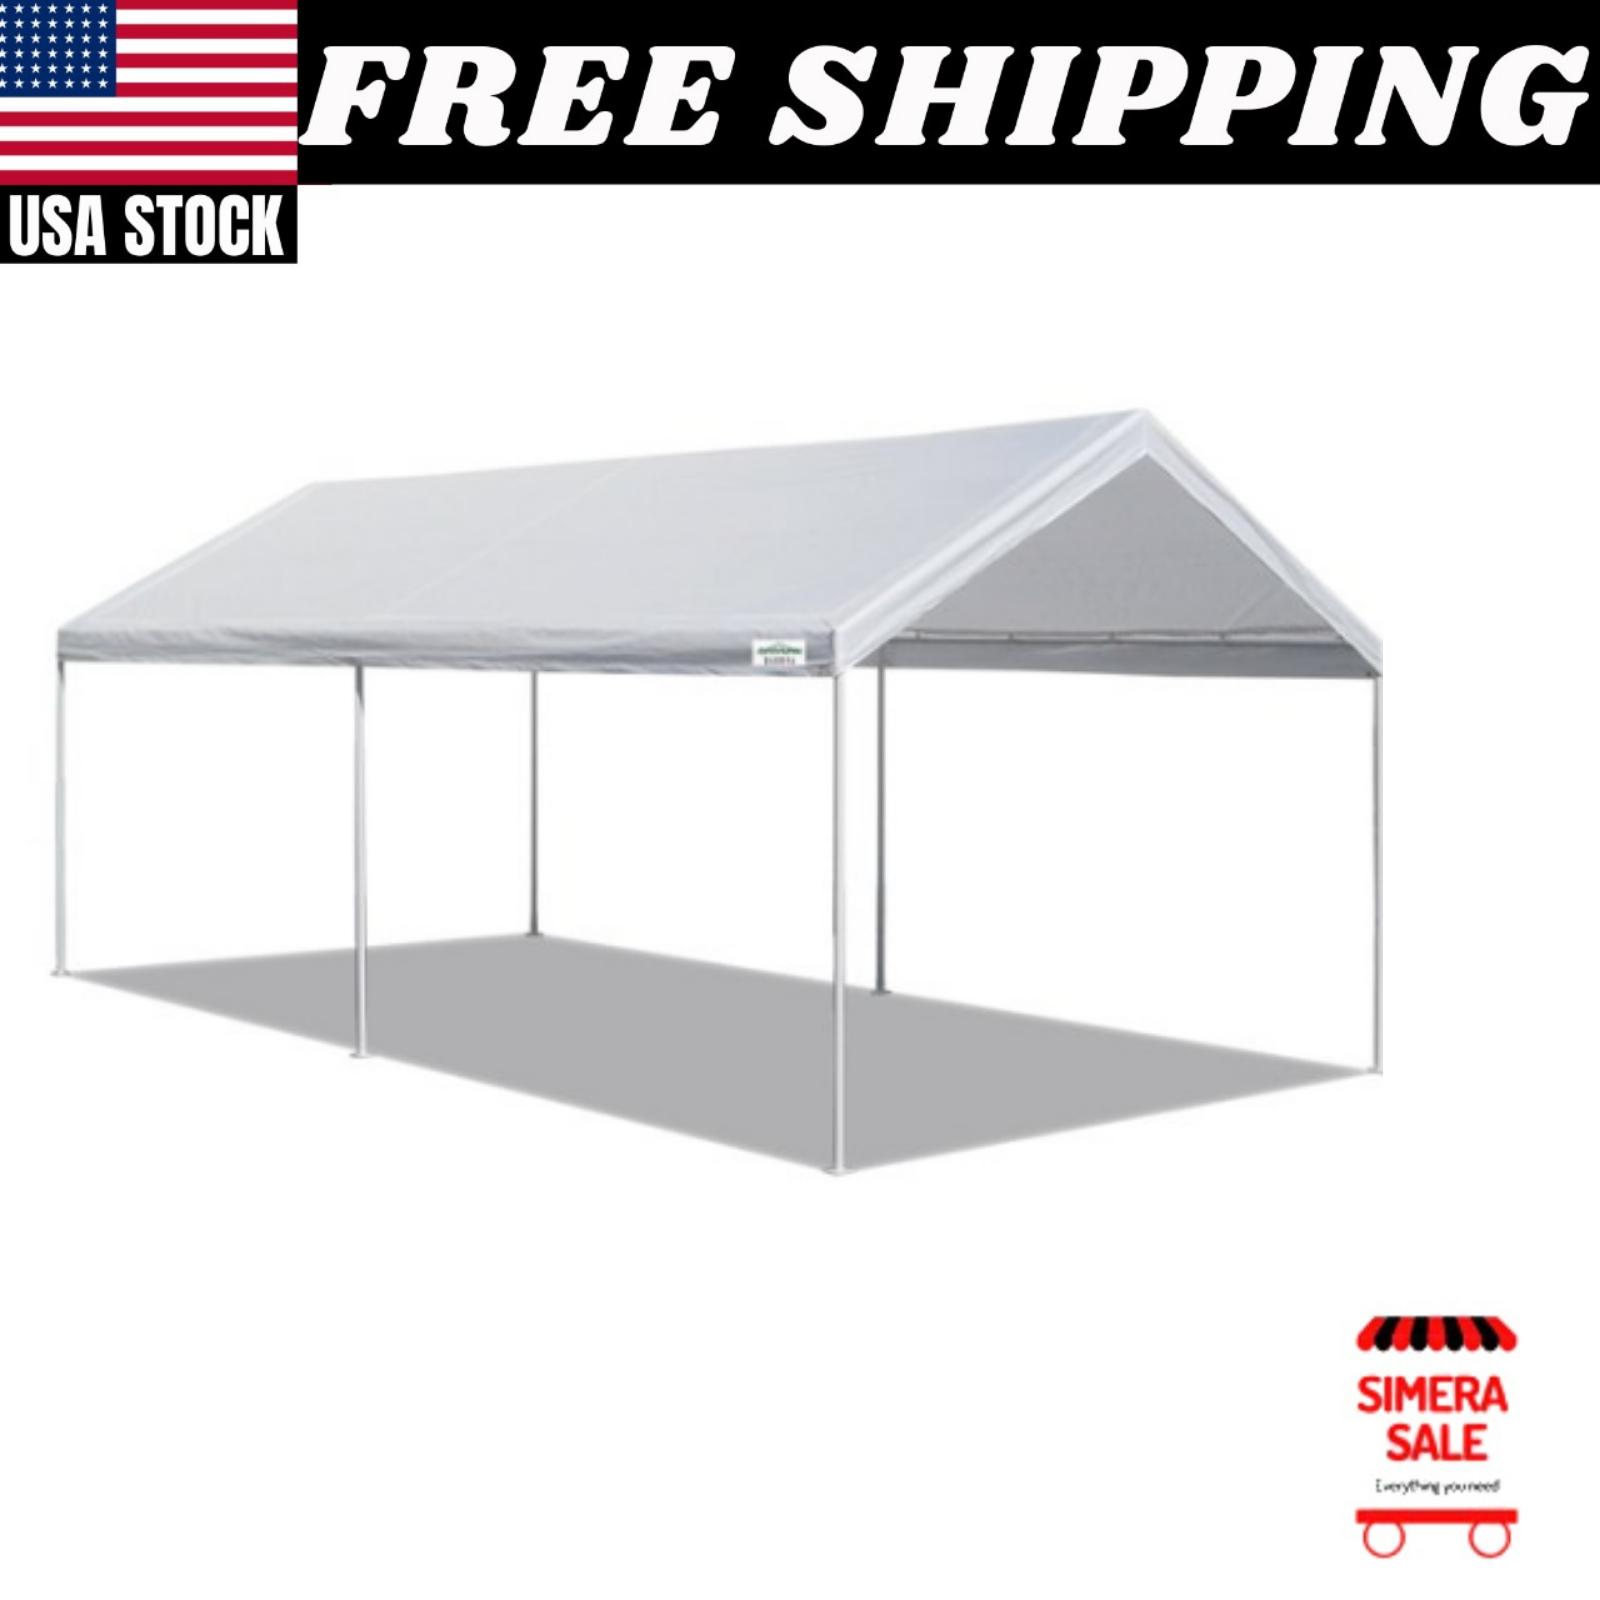 Domain Basic 10 X20 Carport Shelter With Durable Powder Coated Steel Frame Ebay